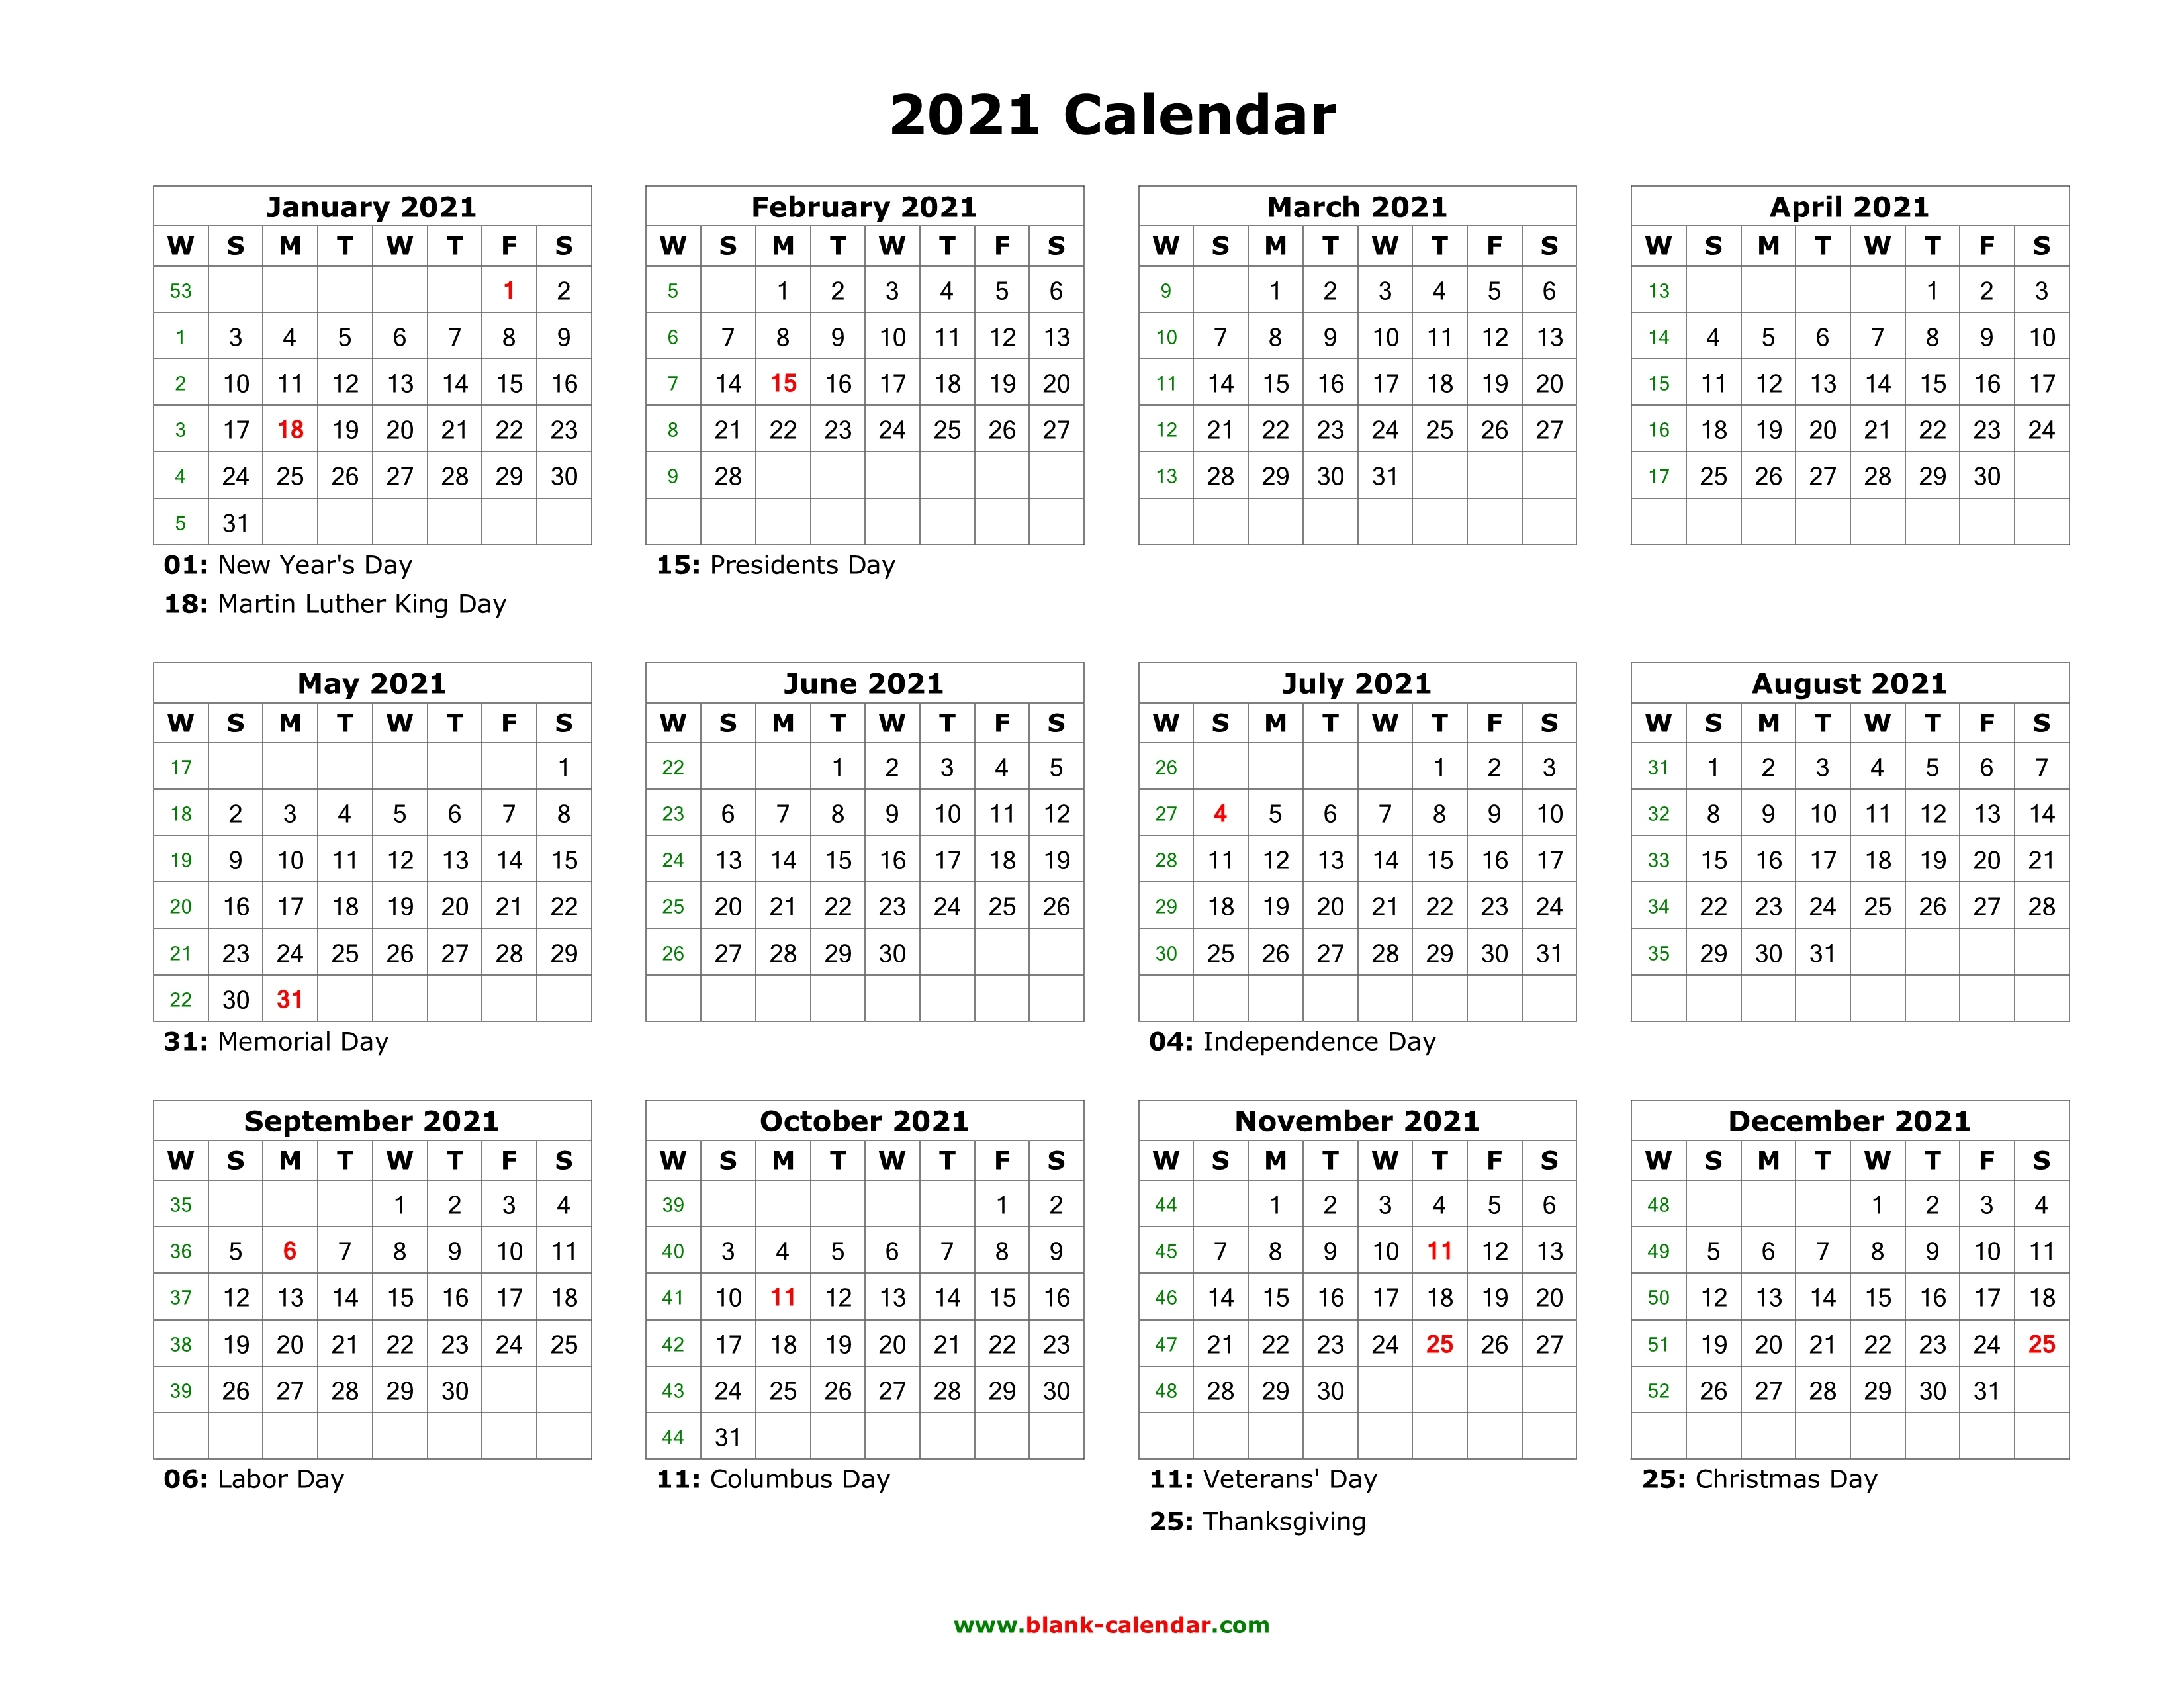 Blank Calendar 2021 | Free Download Calendar Templates 2021 Myanmar Calendar Microsoft Office